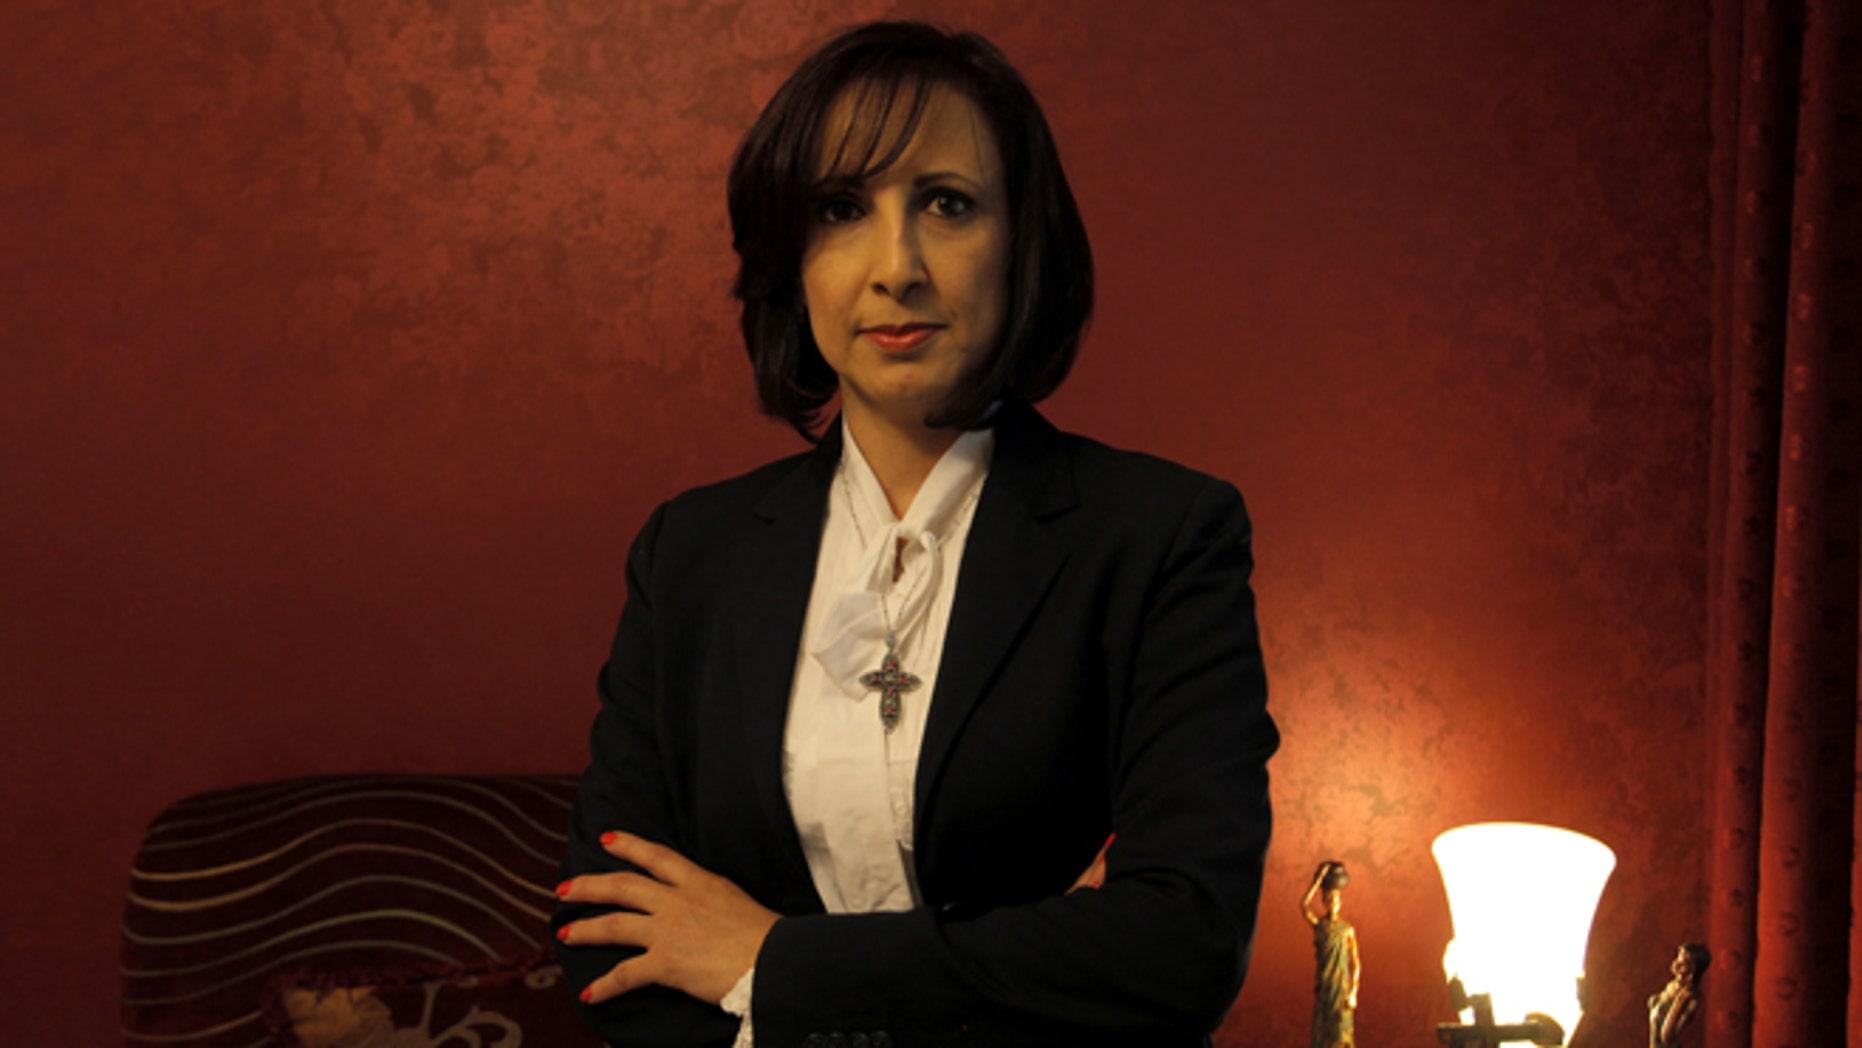 May 26, 2012:  Former assistant manager of corporate operations for Jordan Dubai Islamic Bank Vivian Salameh poses for a portrait in Amman, Jordan.